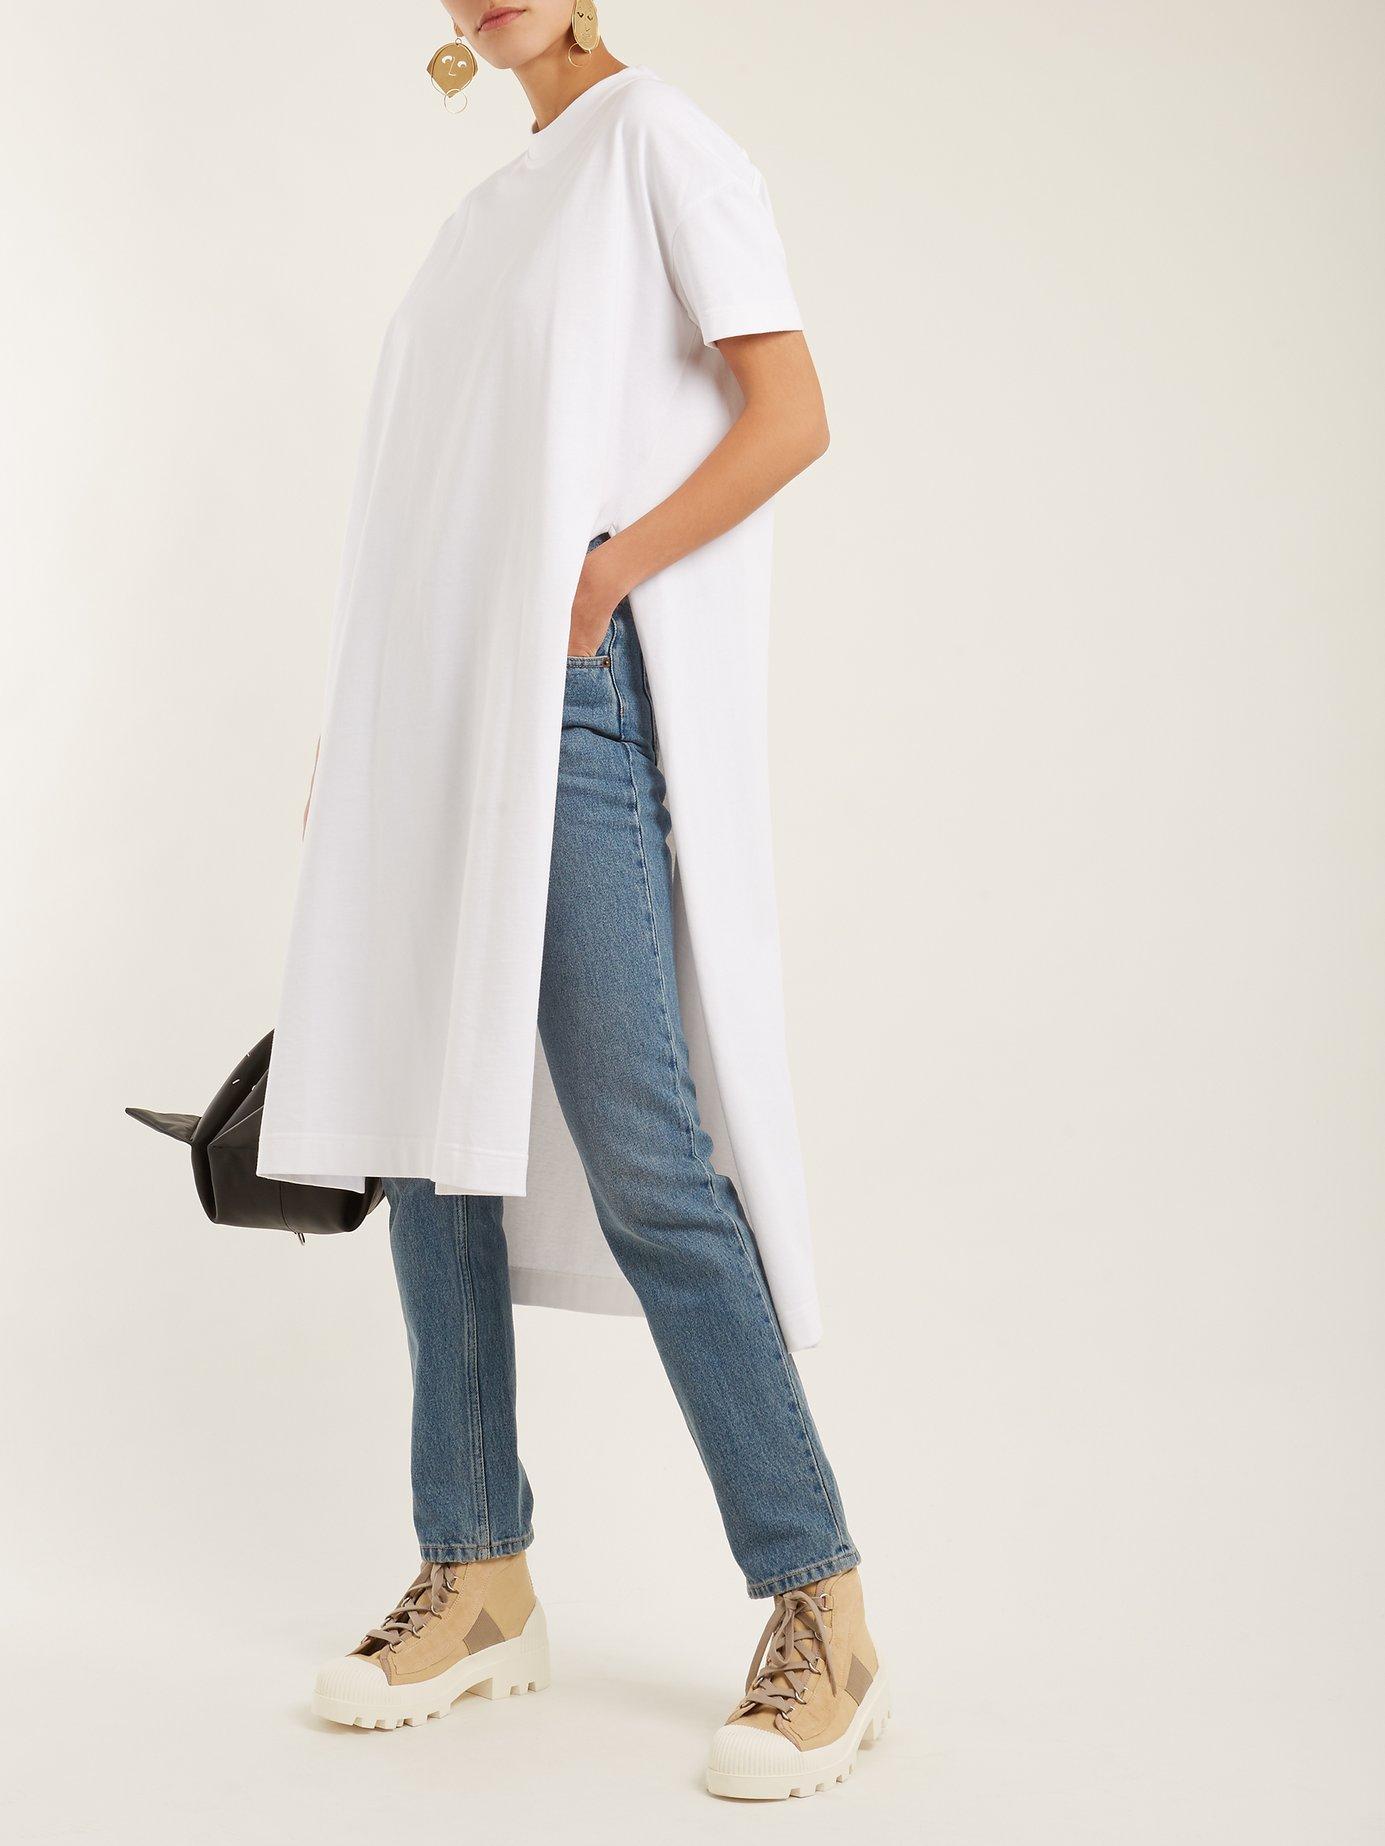 Patri cotton T-shirt dress by Acne Studios